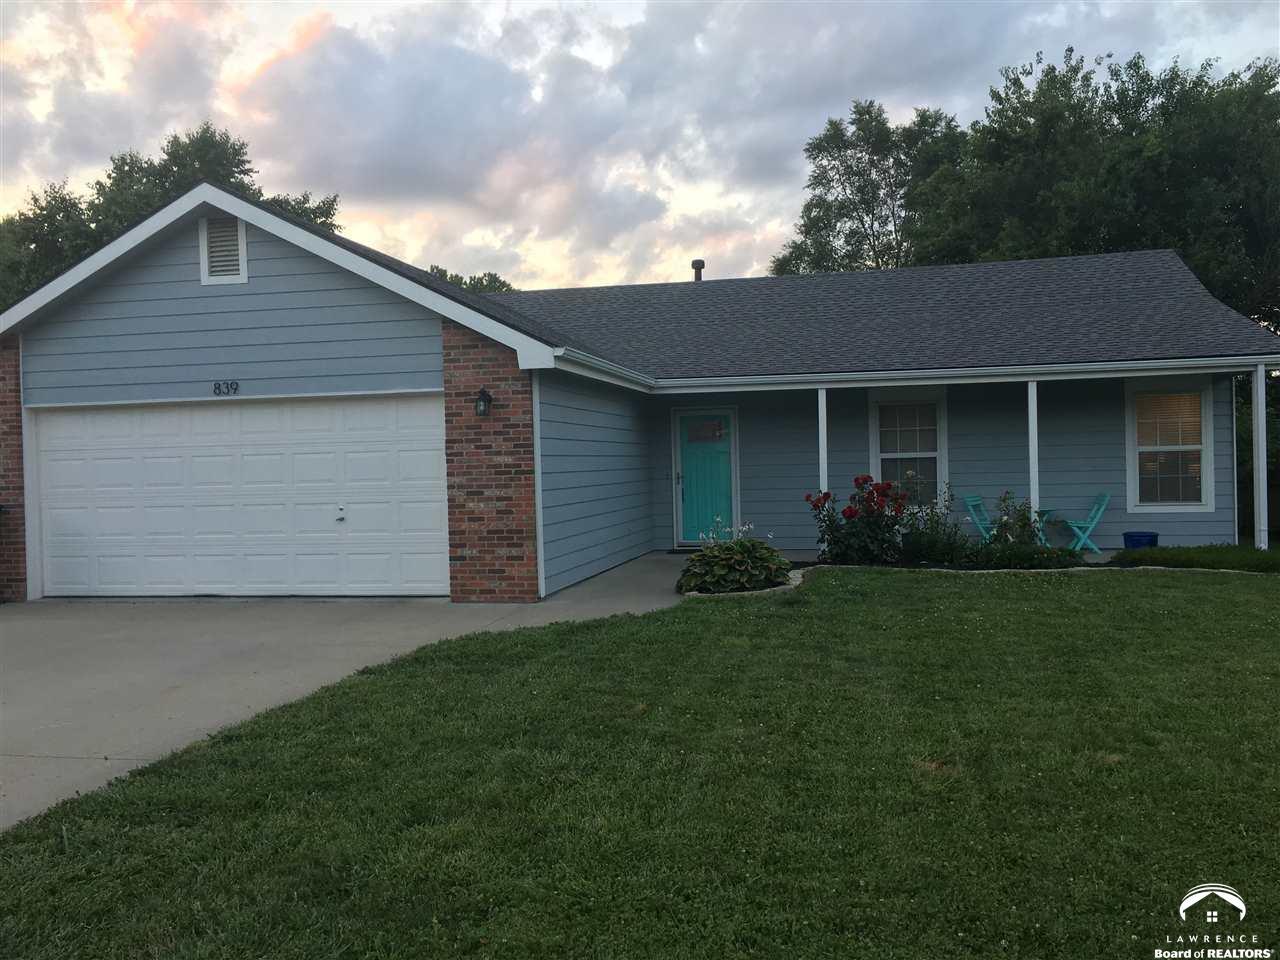 839 Oak St., Lawrence, KS 66044